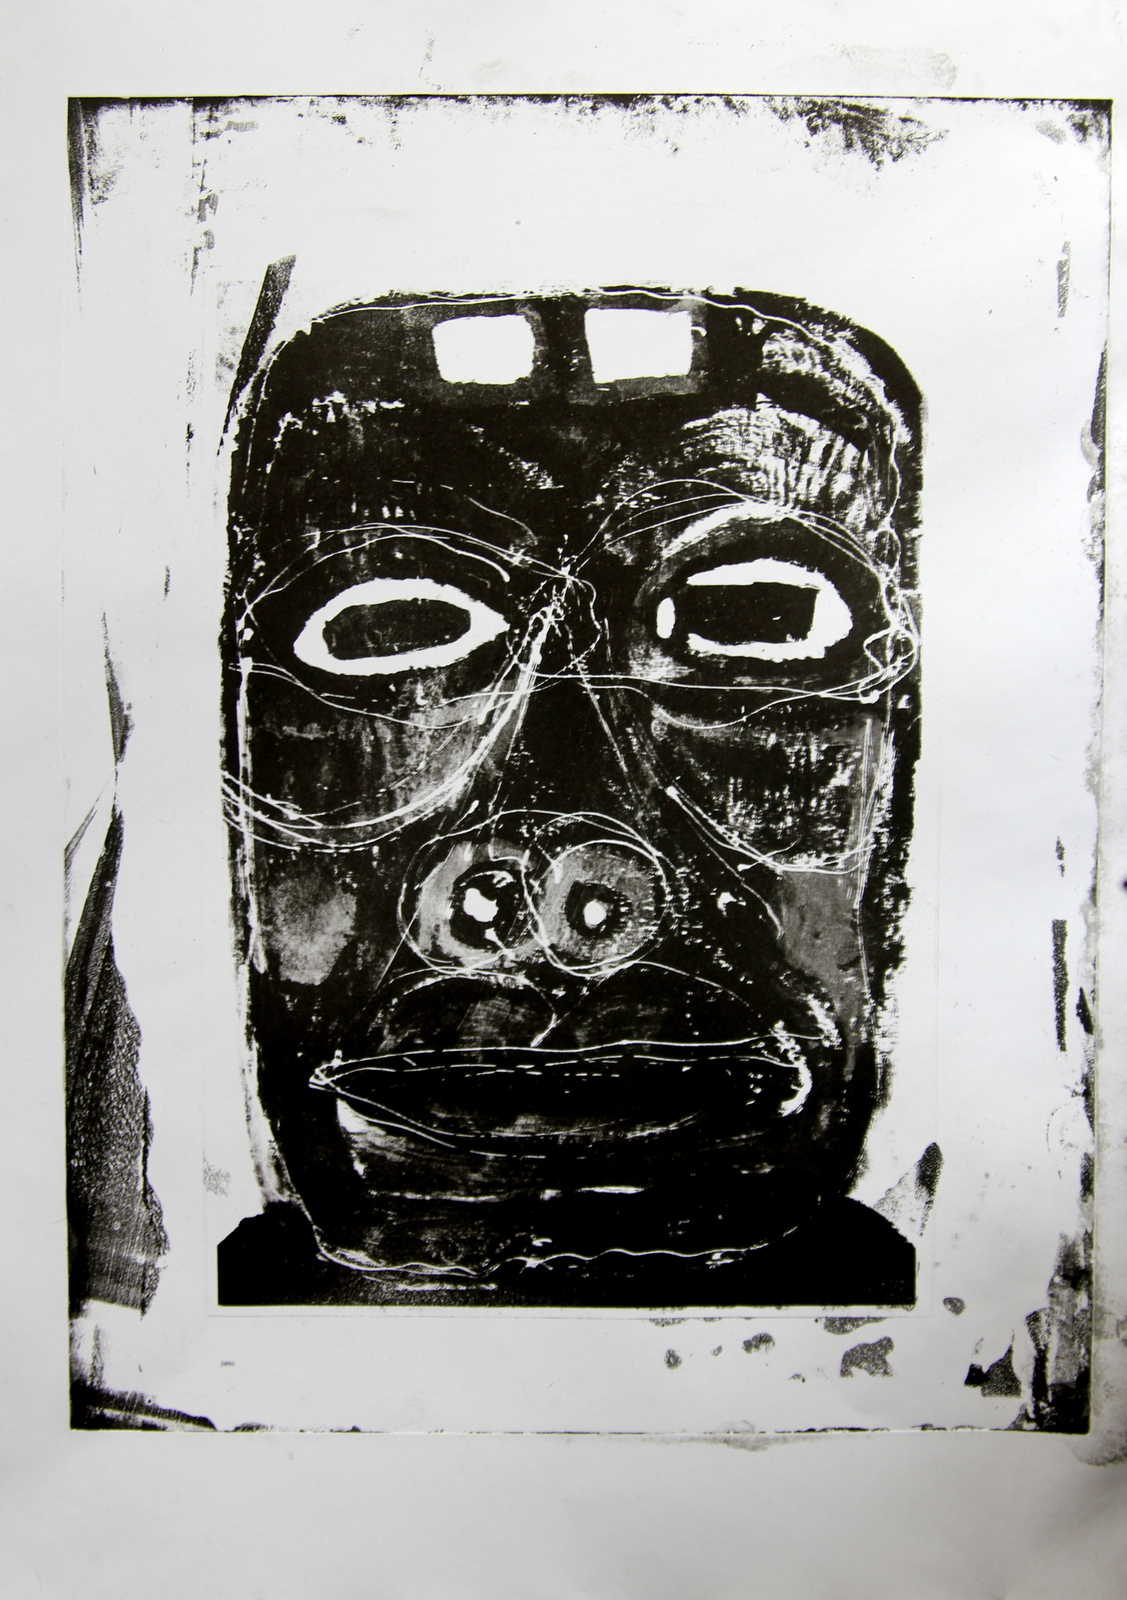 exhumation portrait 0,algrafia, 2017